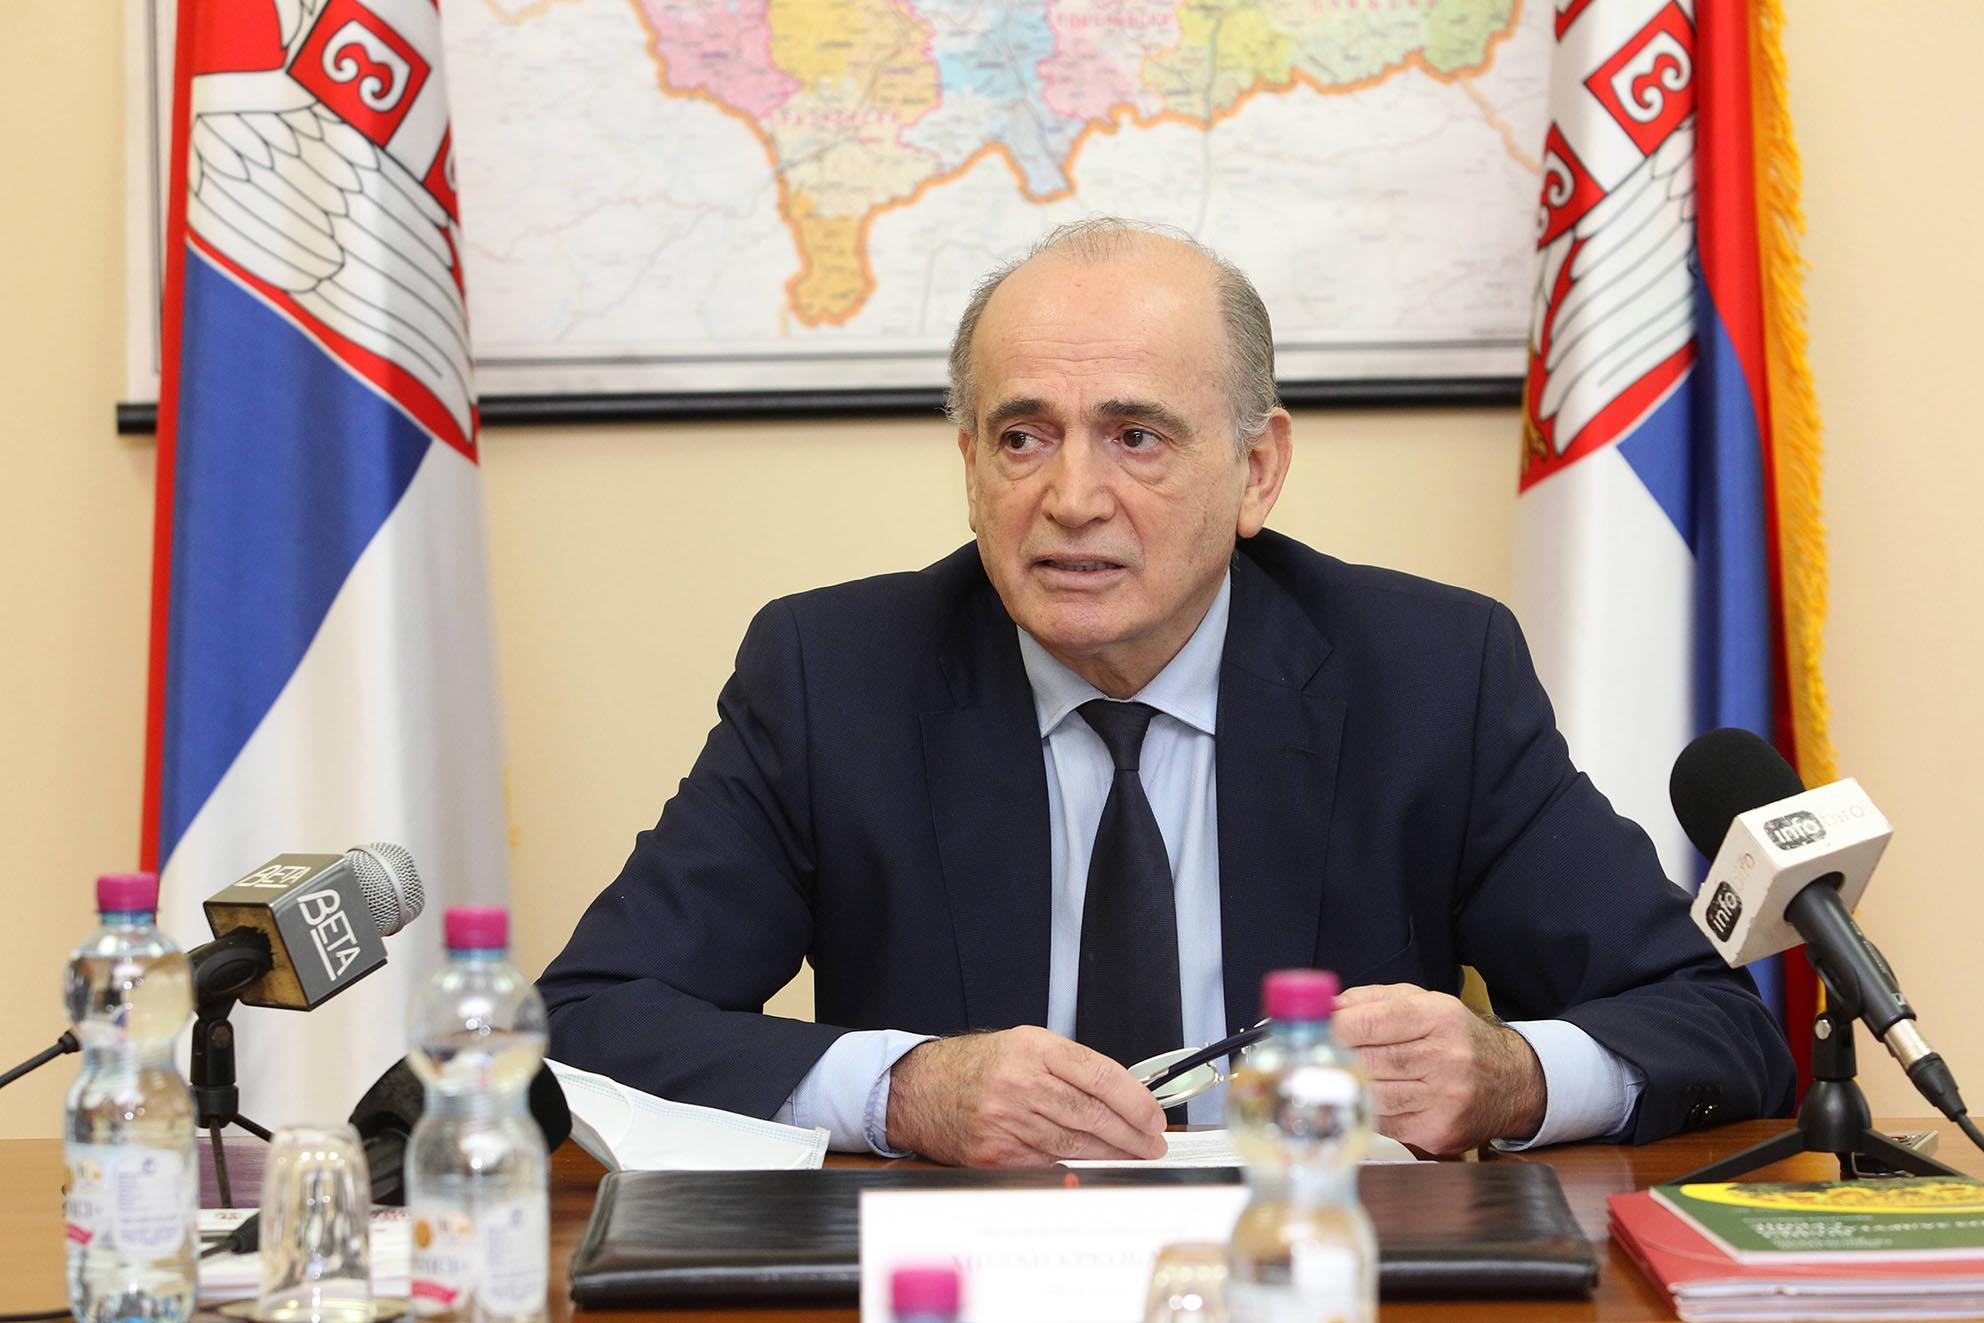 Кркобабић: УСКОРО МИНИБУСЕВИ ЗА СЕЛА СРБИЈЕ